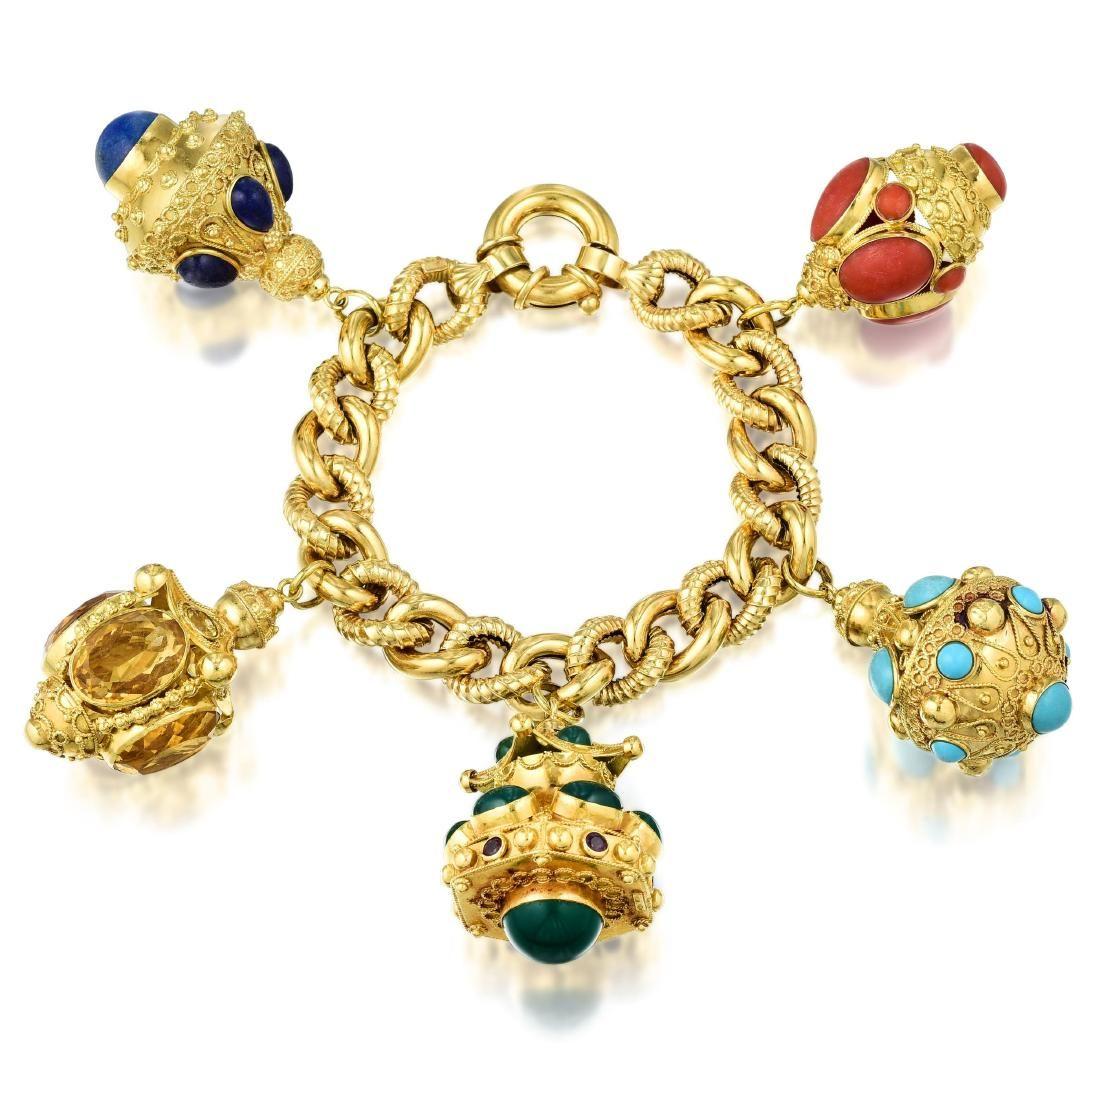 A Multi-Gemstone Charm Bracelet, Italian